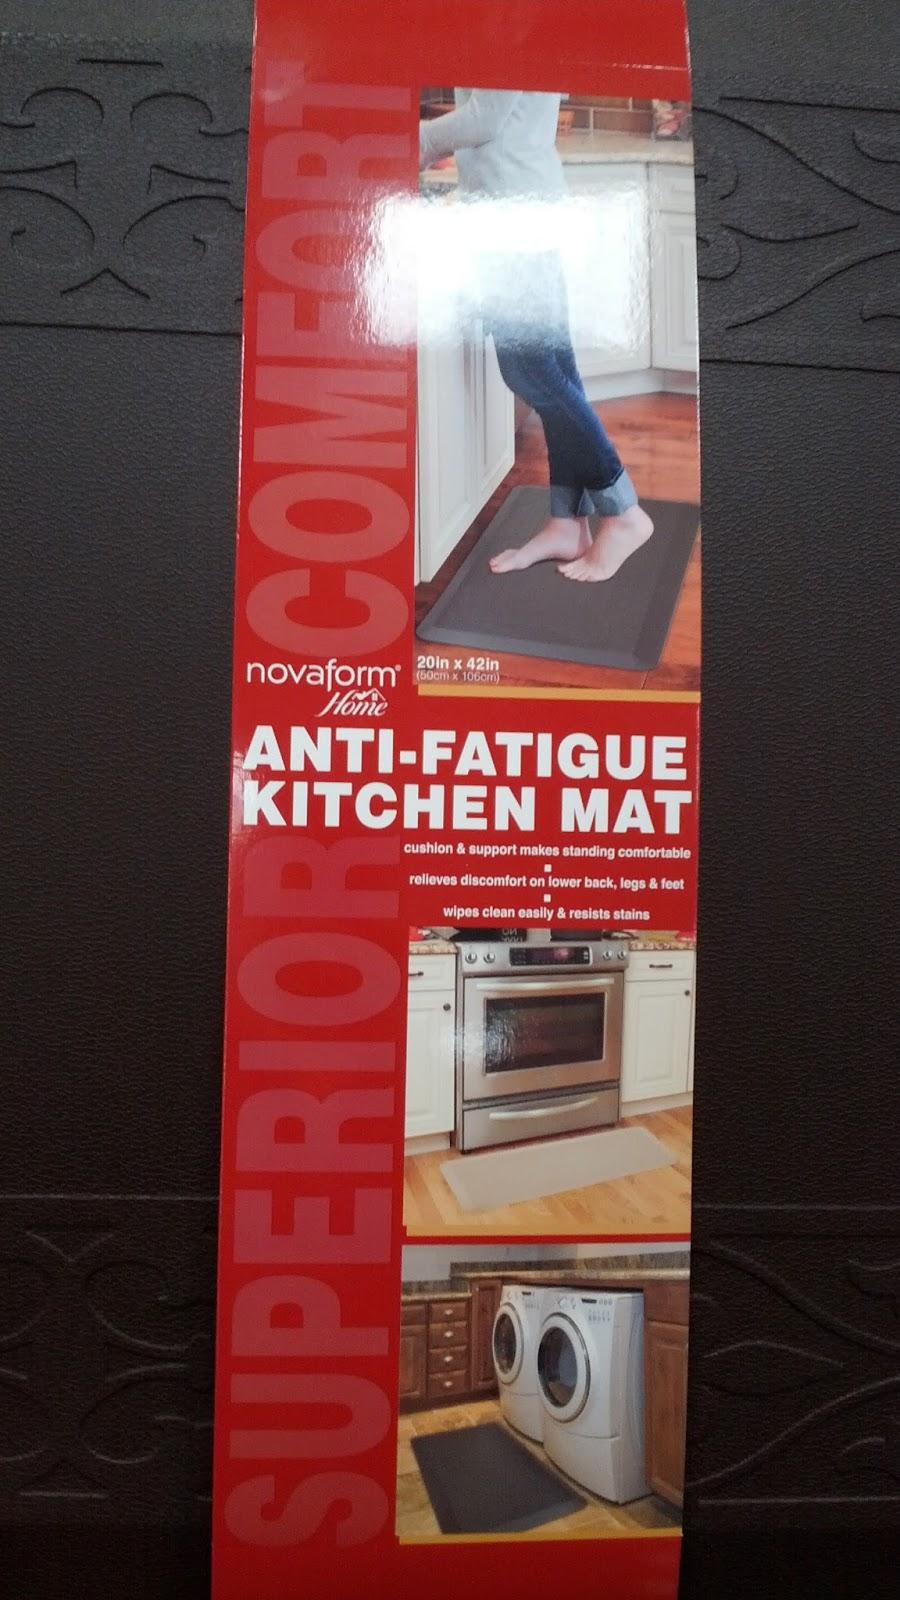 kitchen ideas novaform fatigue also costco mats anti fascinating mat pictures